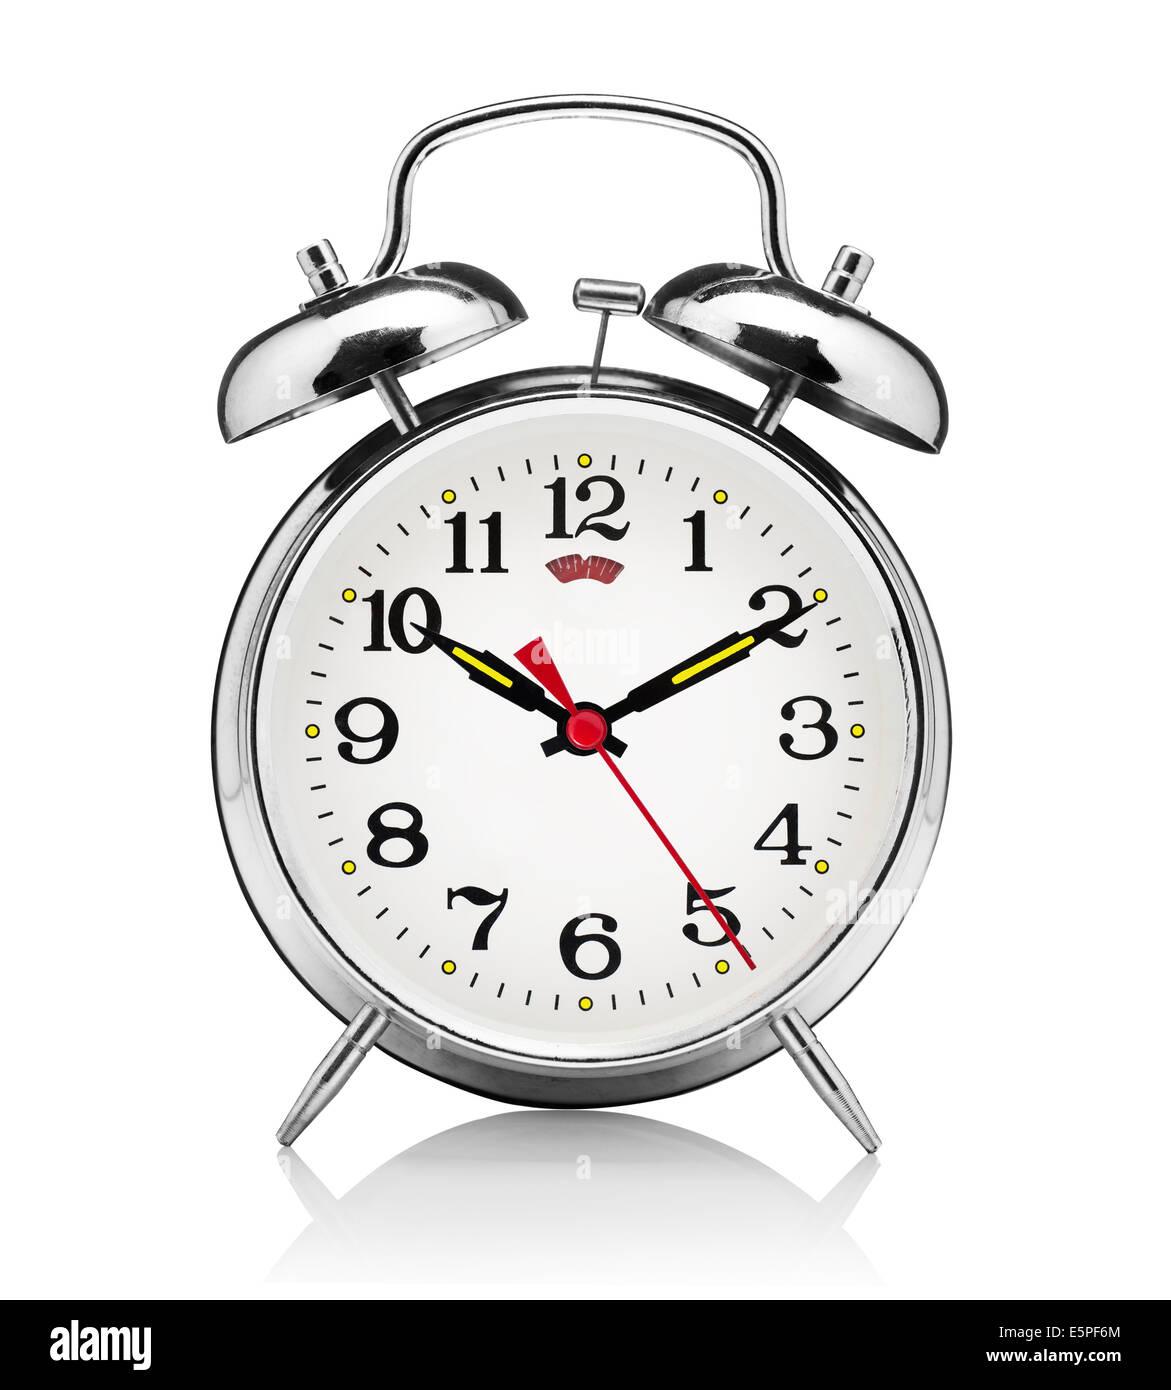 classical alarm clock isolated on white background Stock Photo